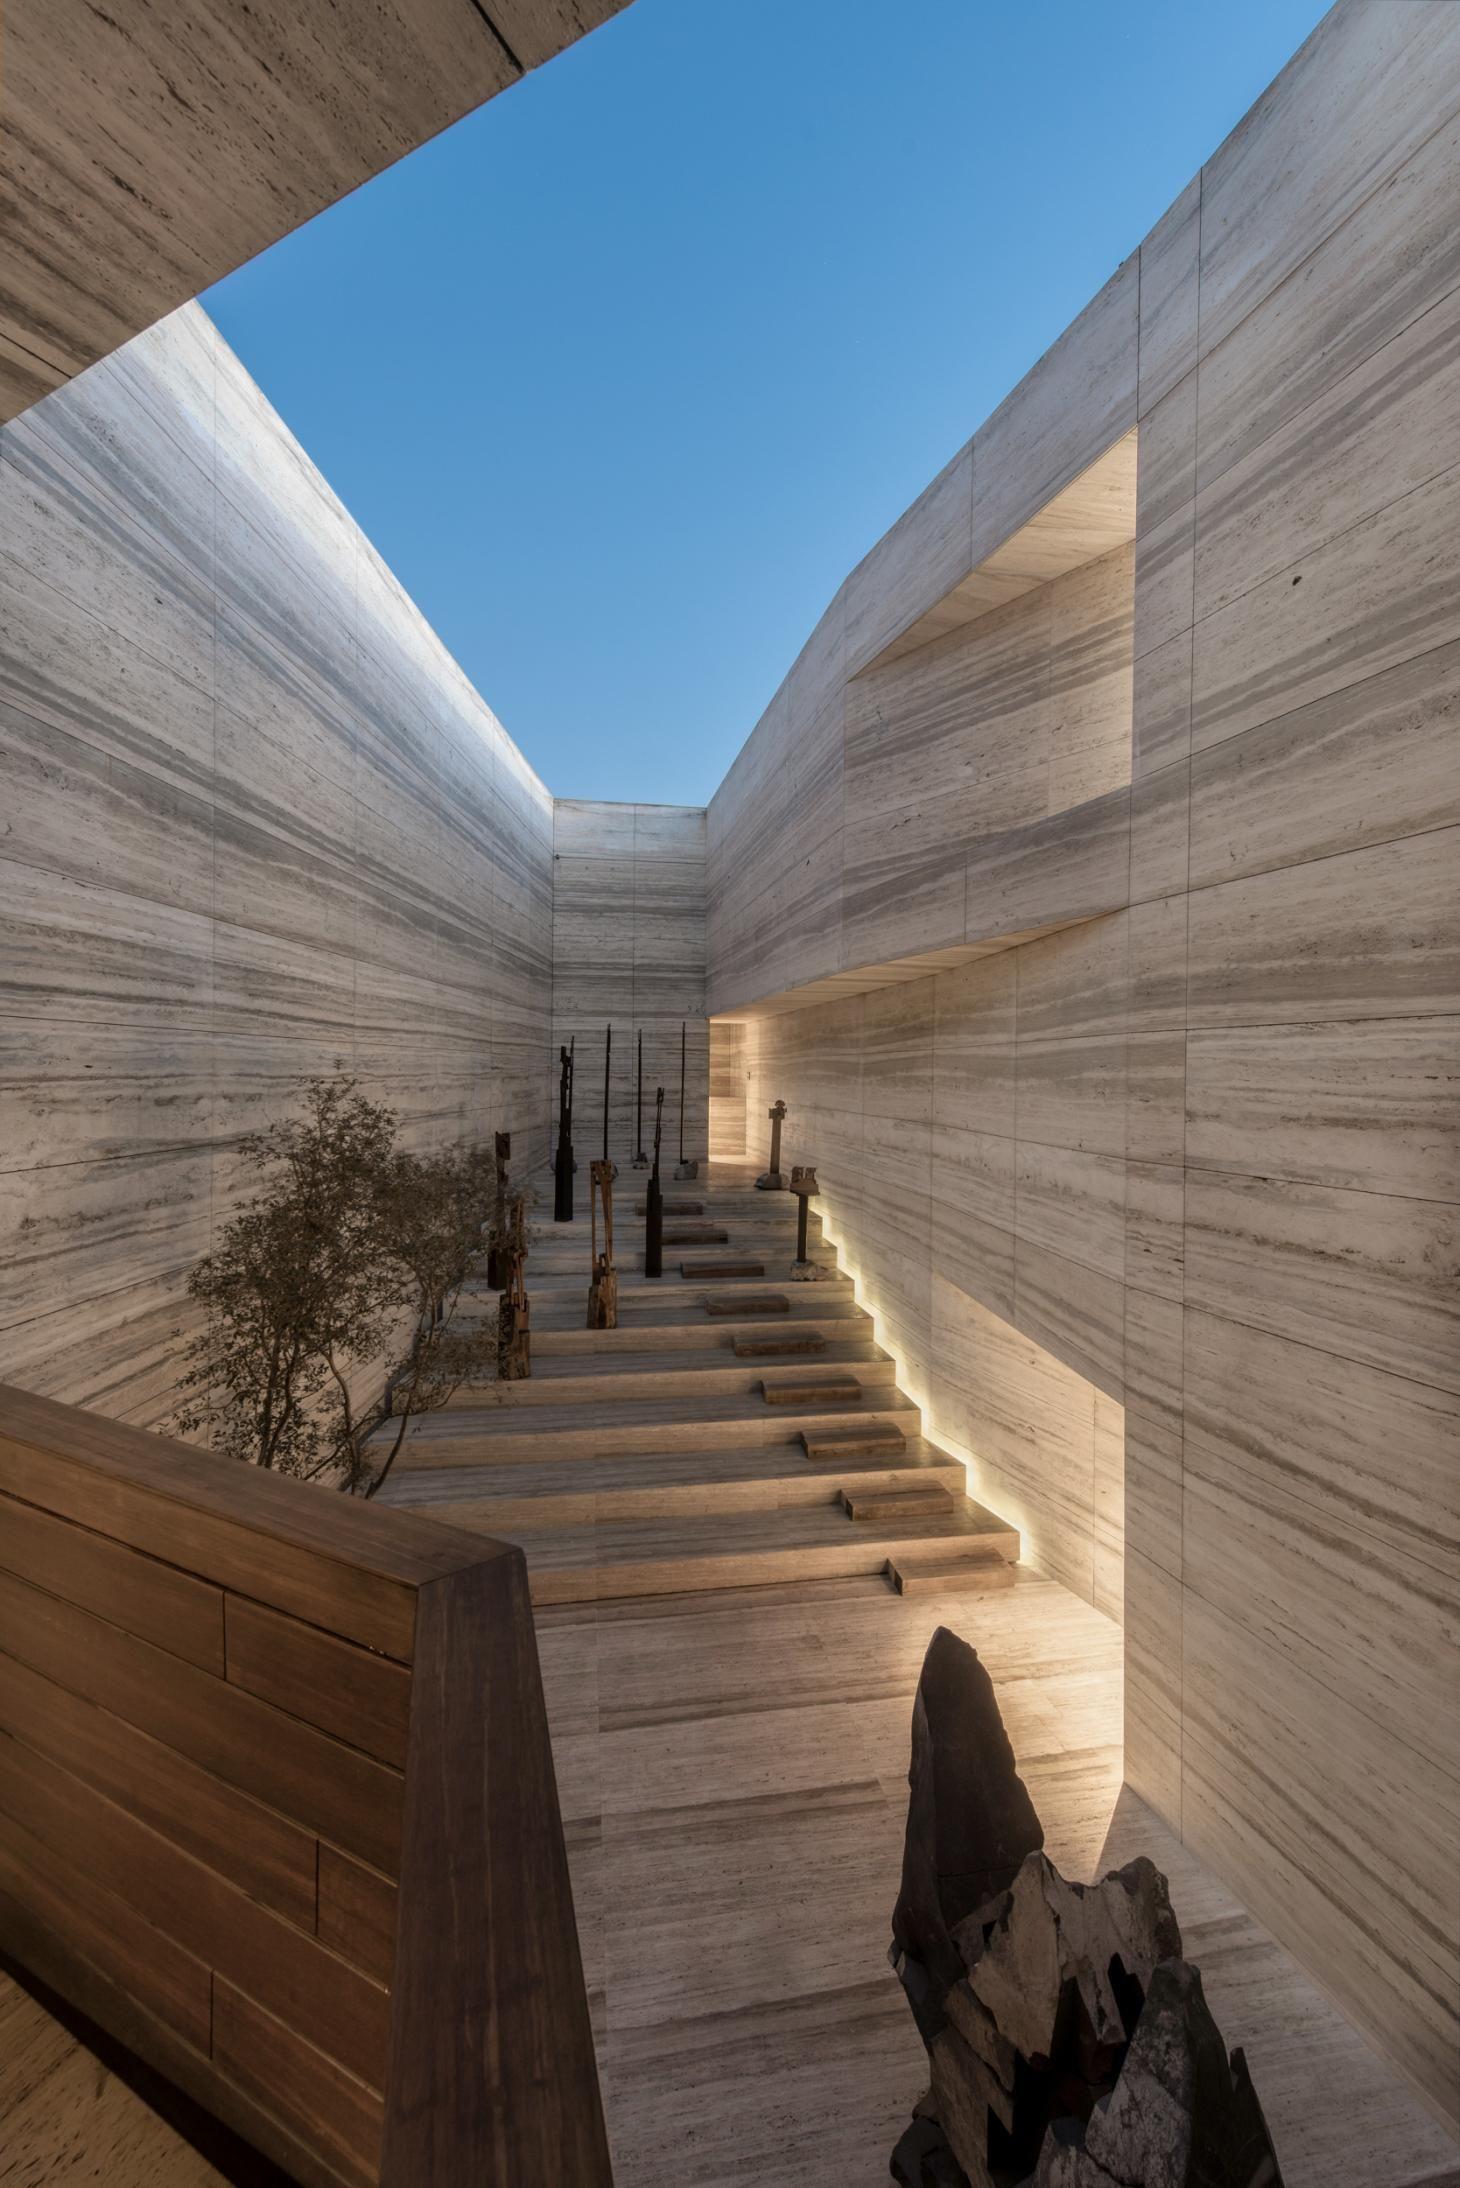 Pak Clay House Travertine Marble Wall Cladding Tiles Design Price in Rawalpindi Pakistan